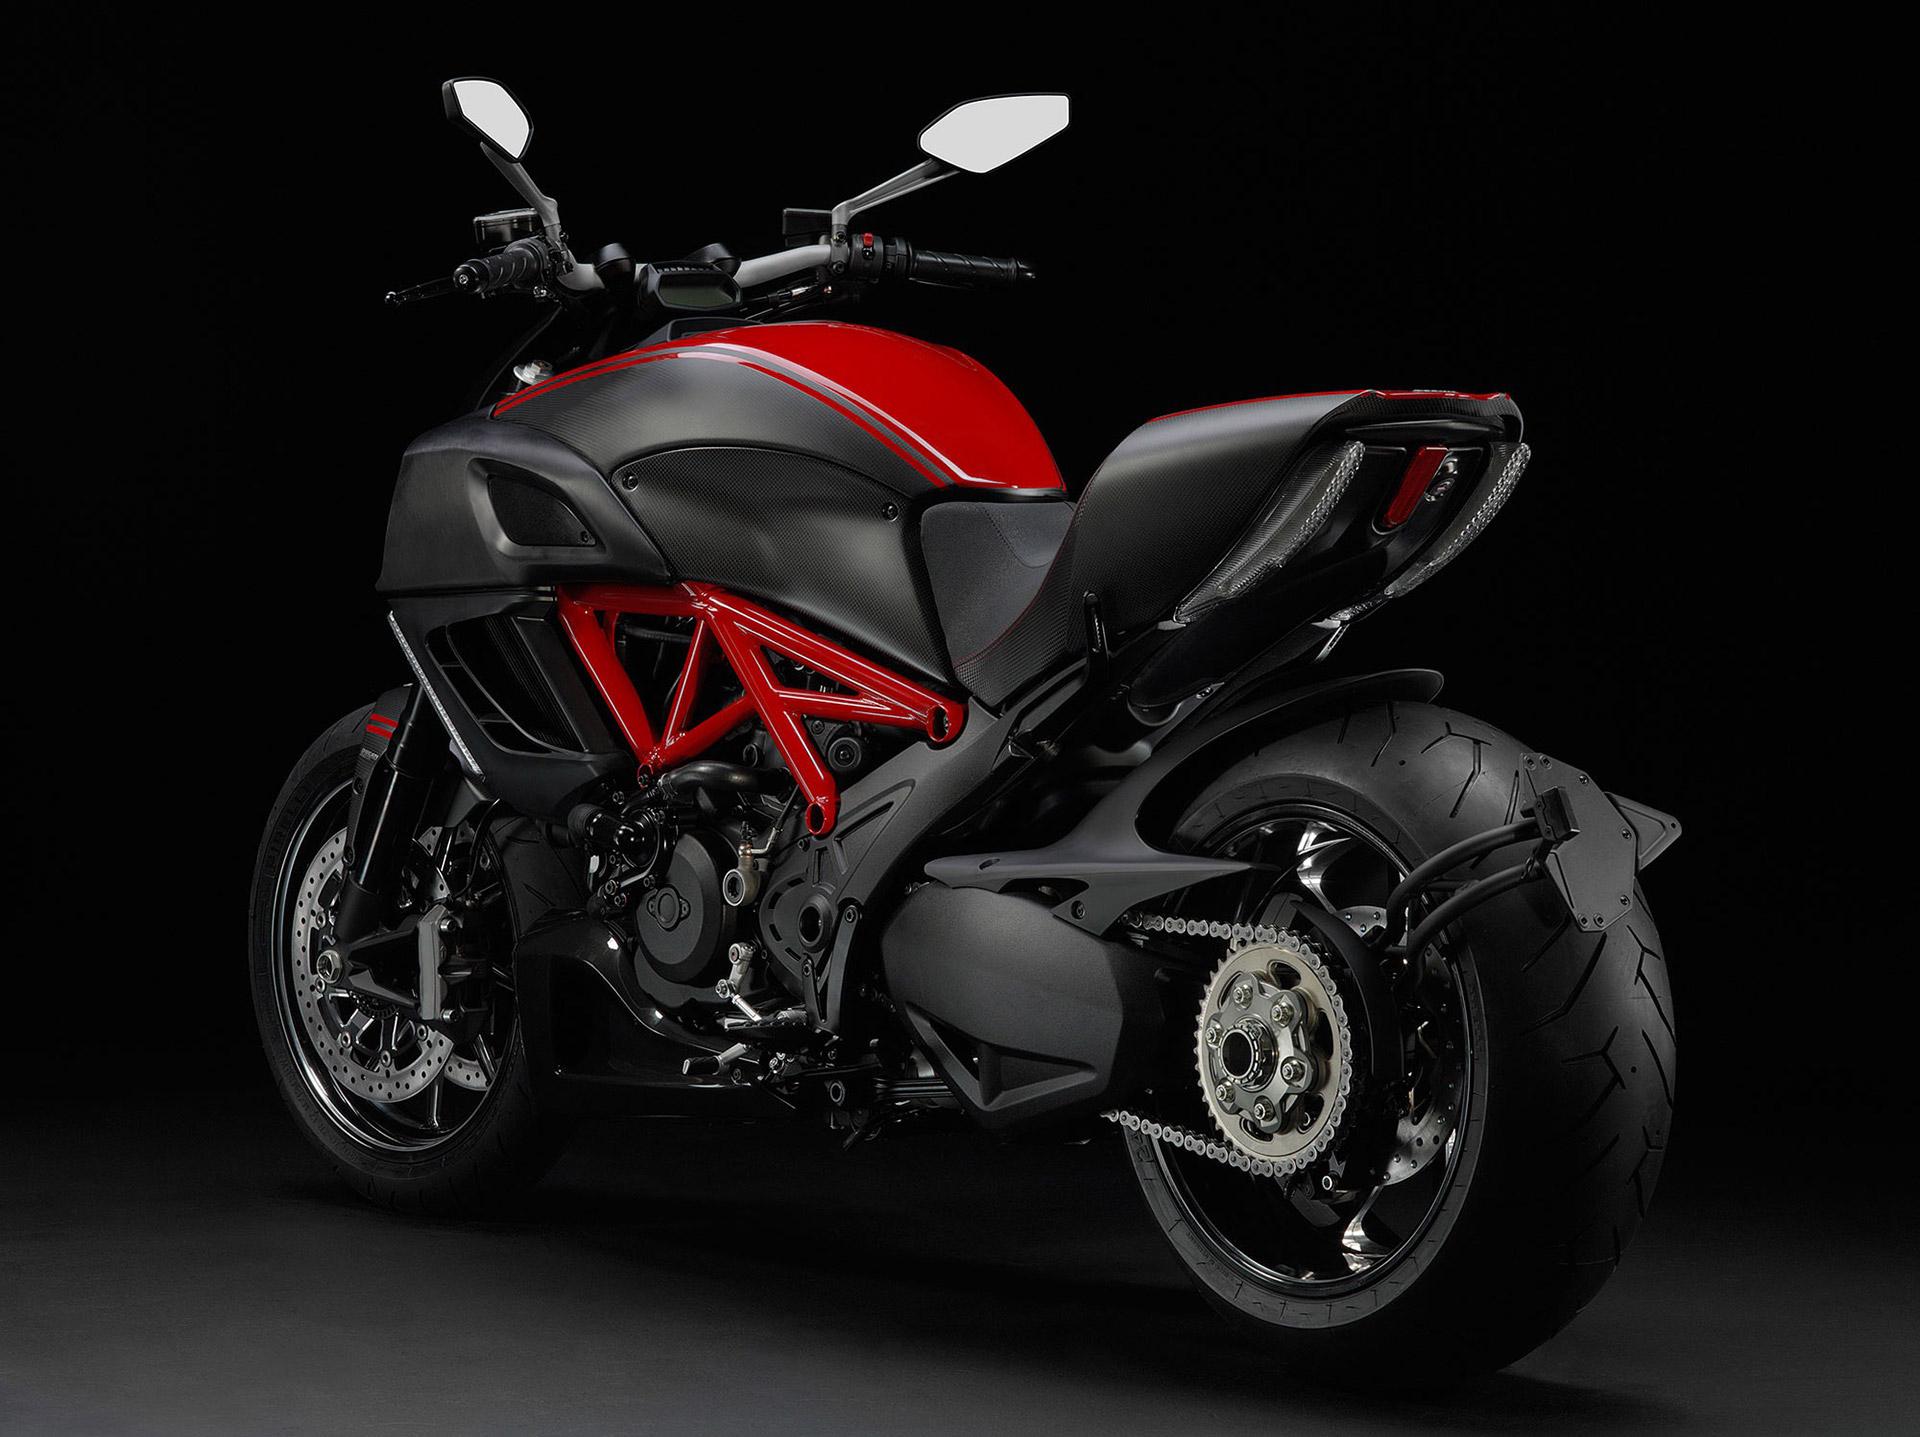 2013 Ducati Diavel Carbon6